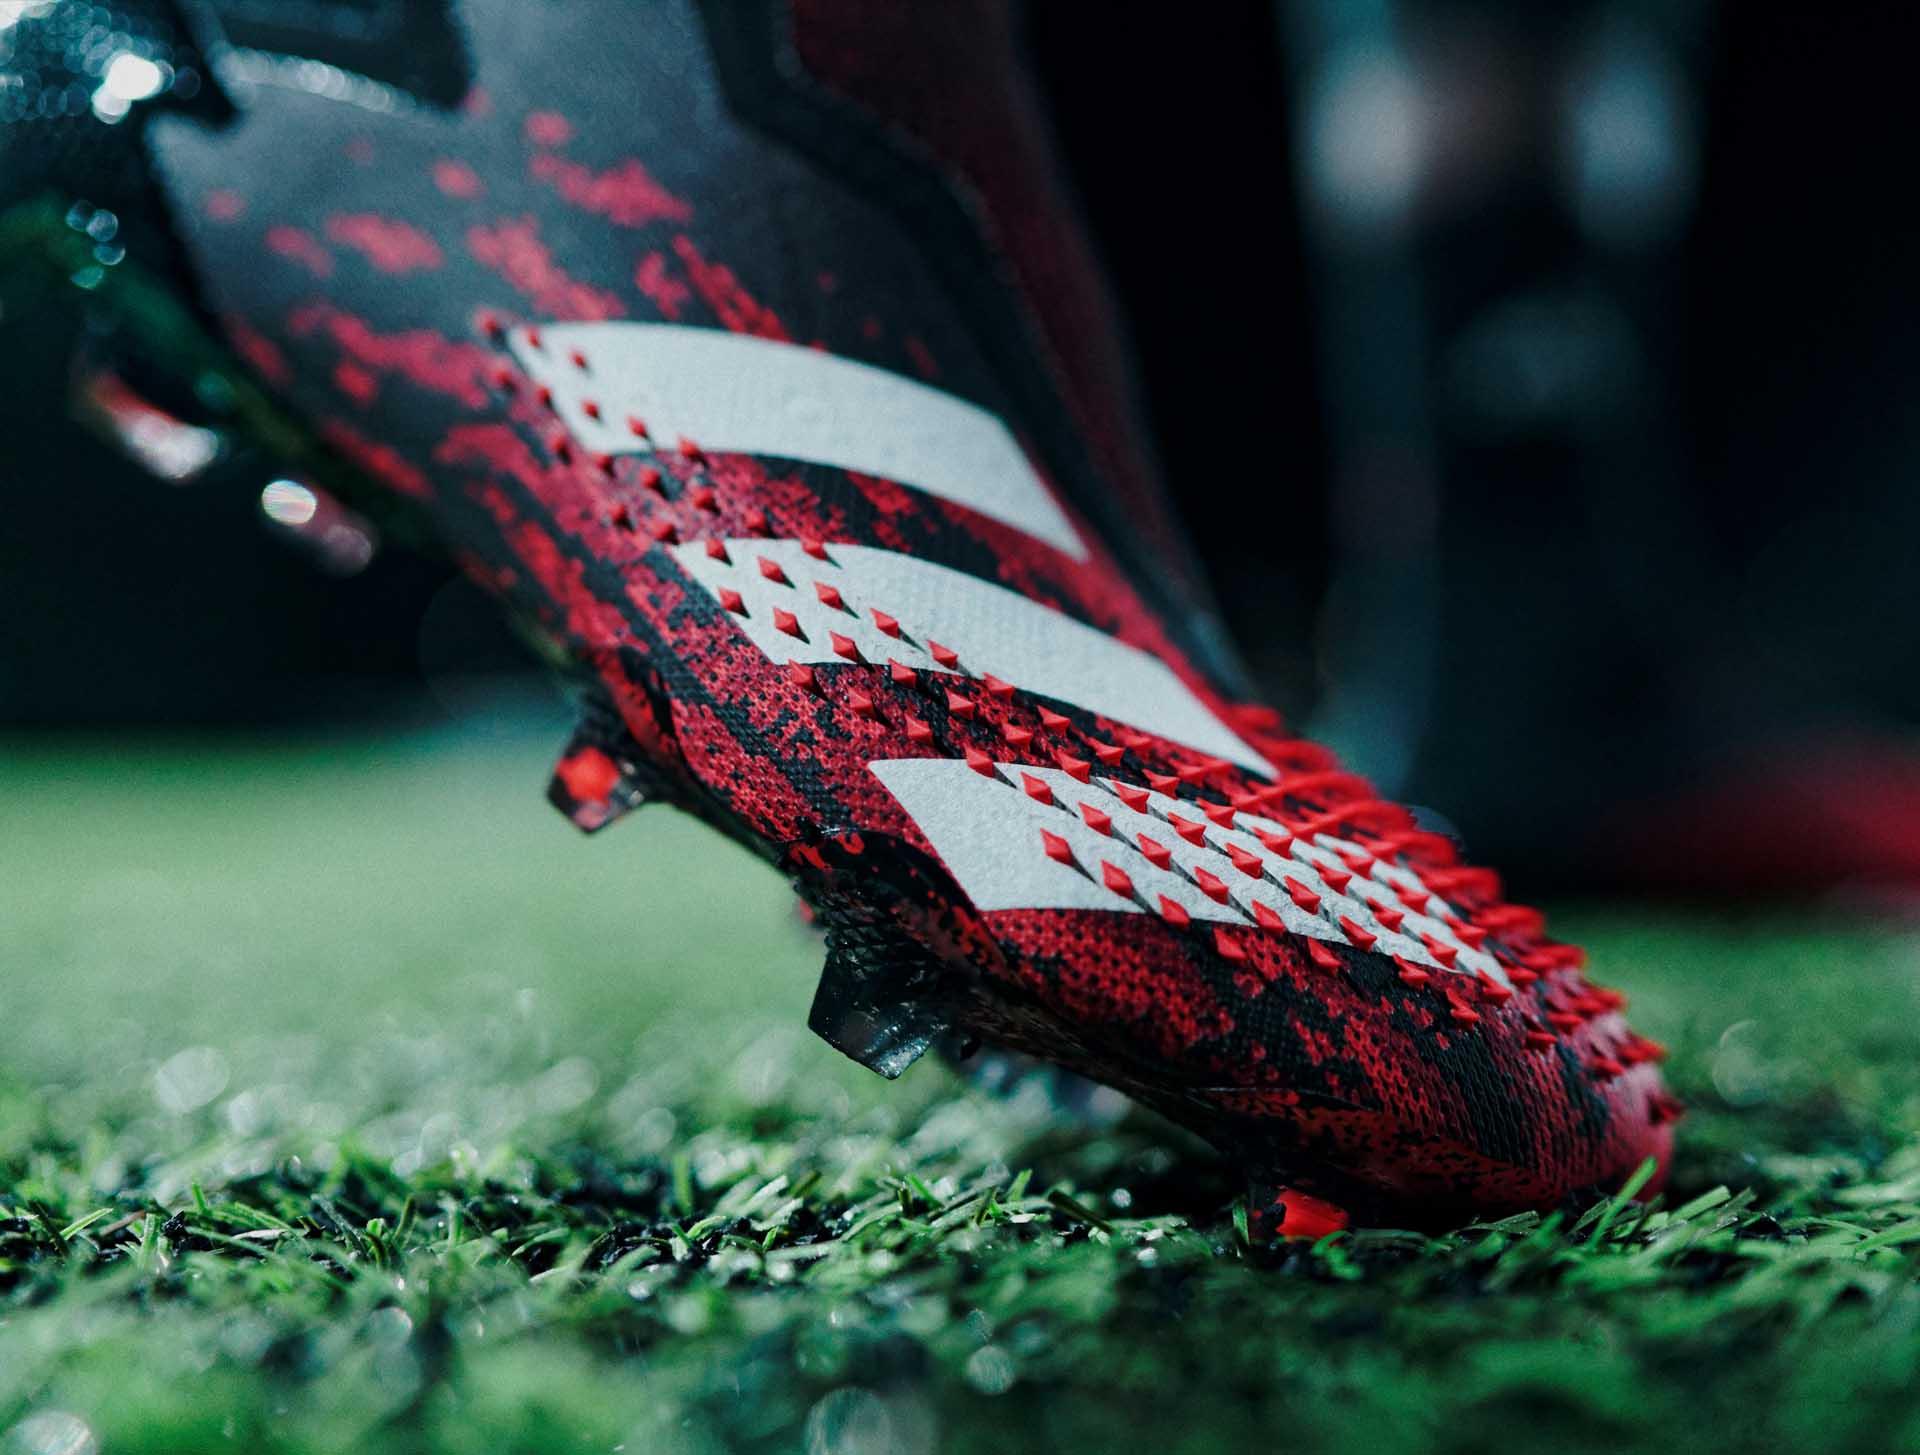 4-adidas-predator-mutator-20-review-min.jpg